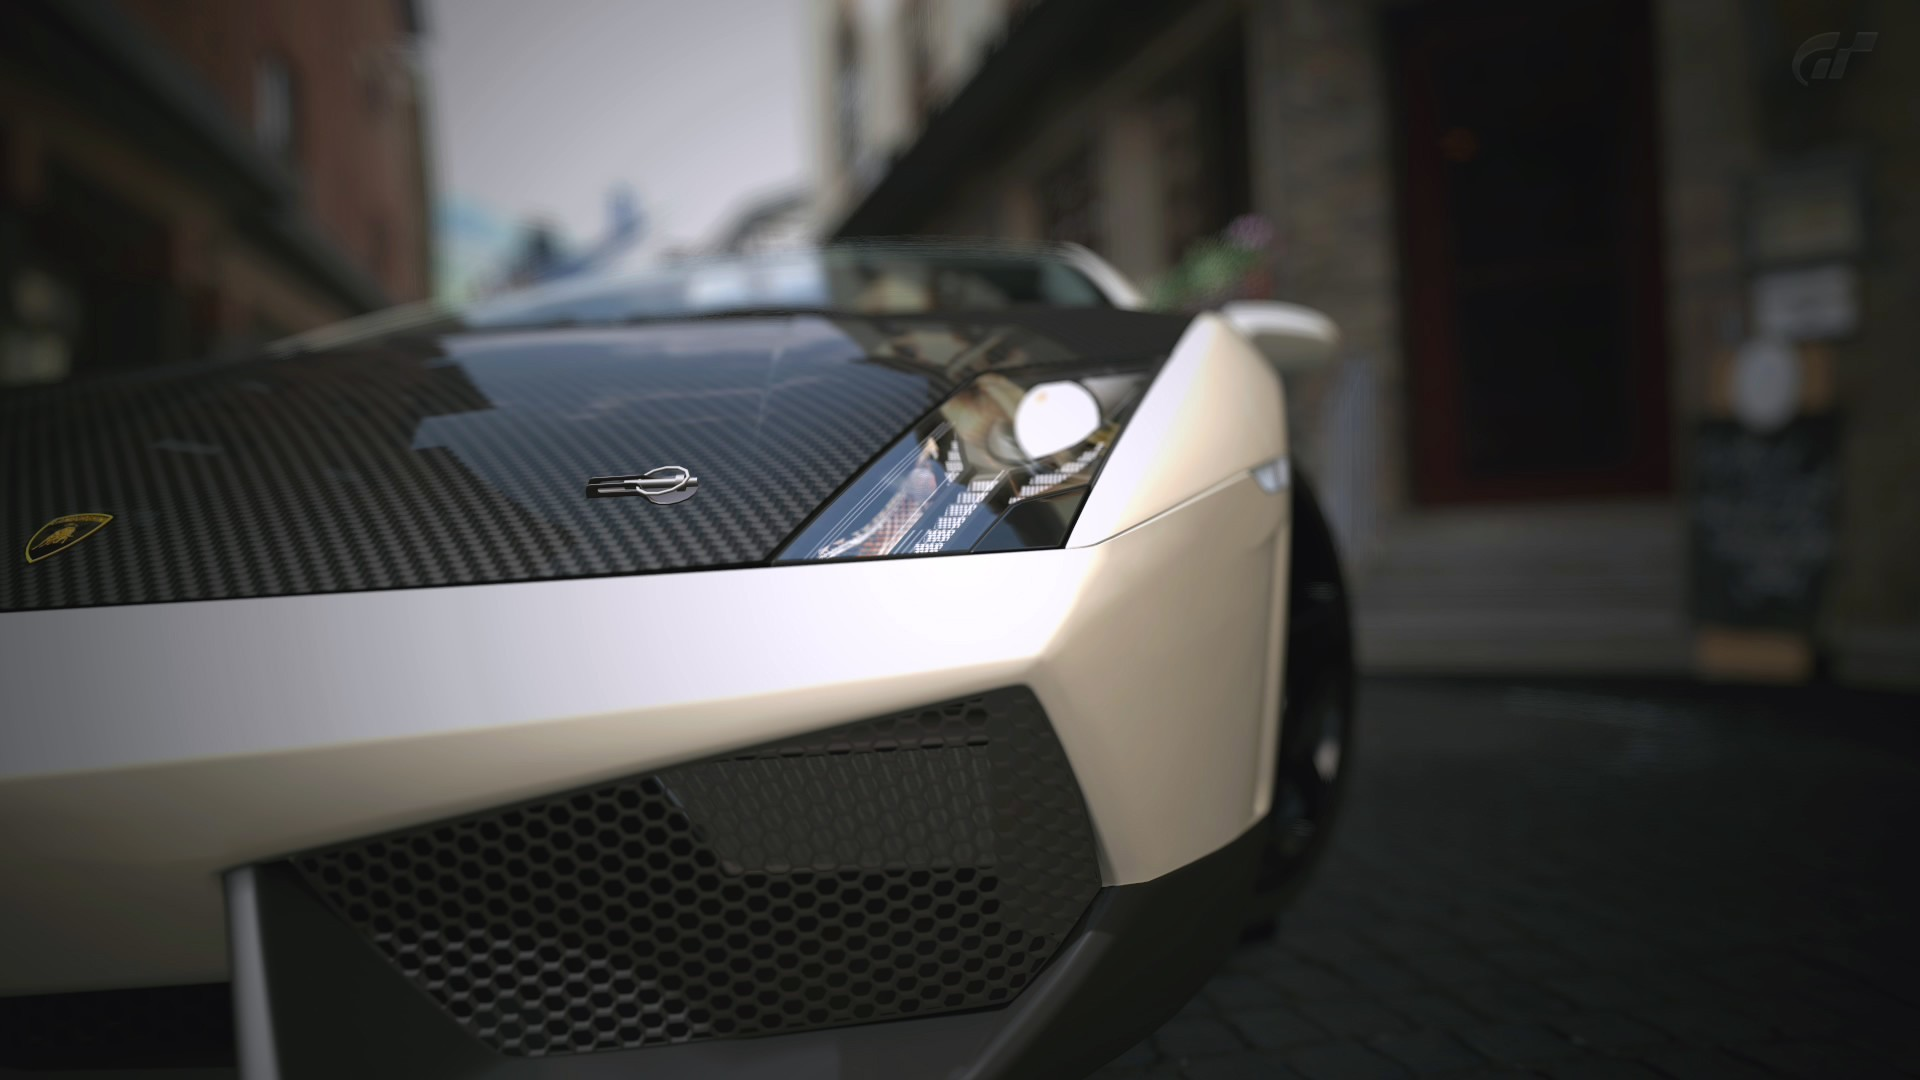 Cars lamborghini carbon fiber wallpapers HD.